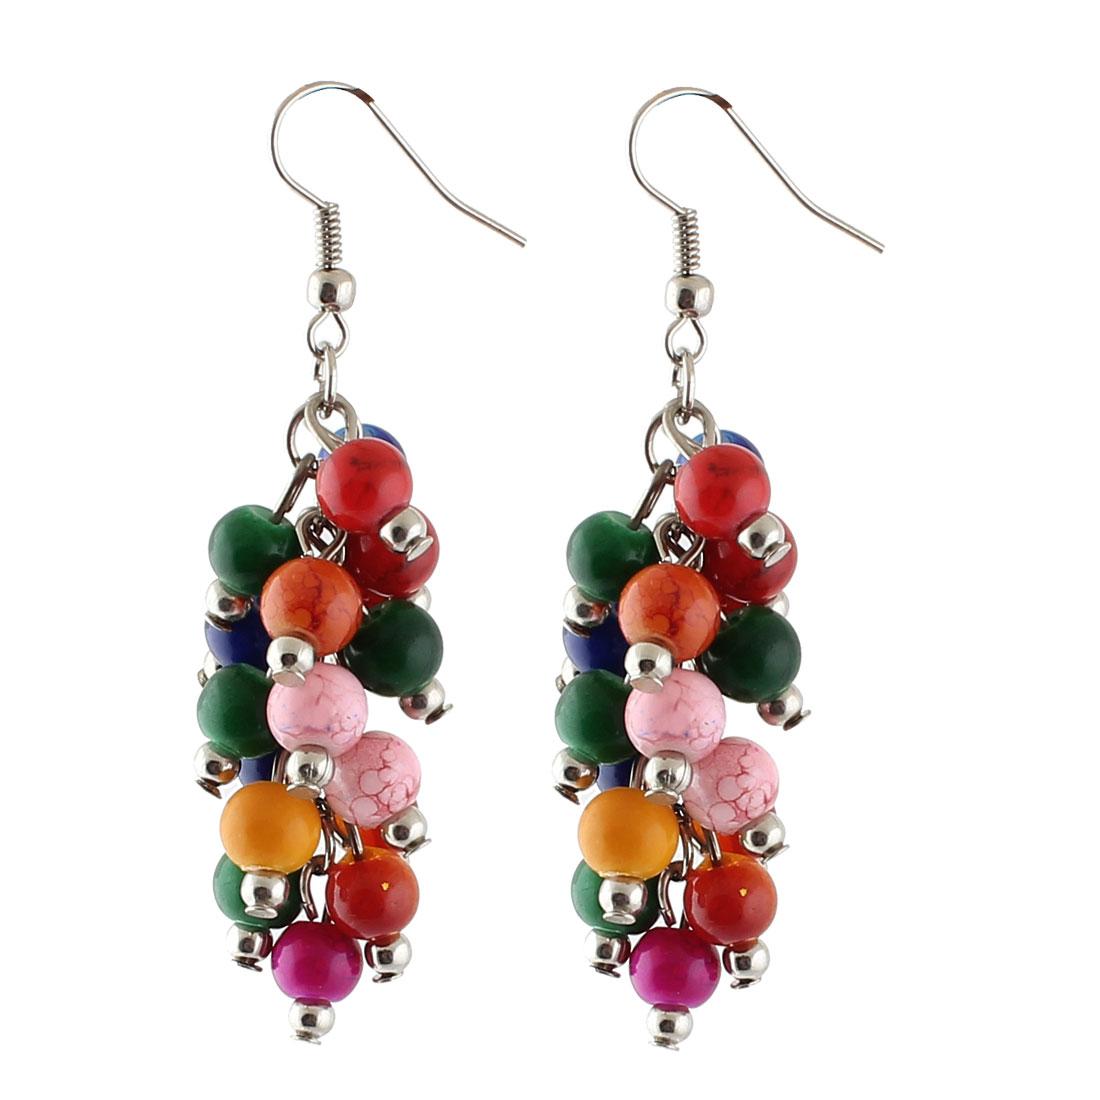 Lady Plastic Multicolor Beads Pendant Fish Hook Earrings Ornaments Pair